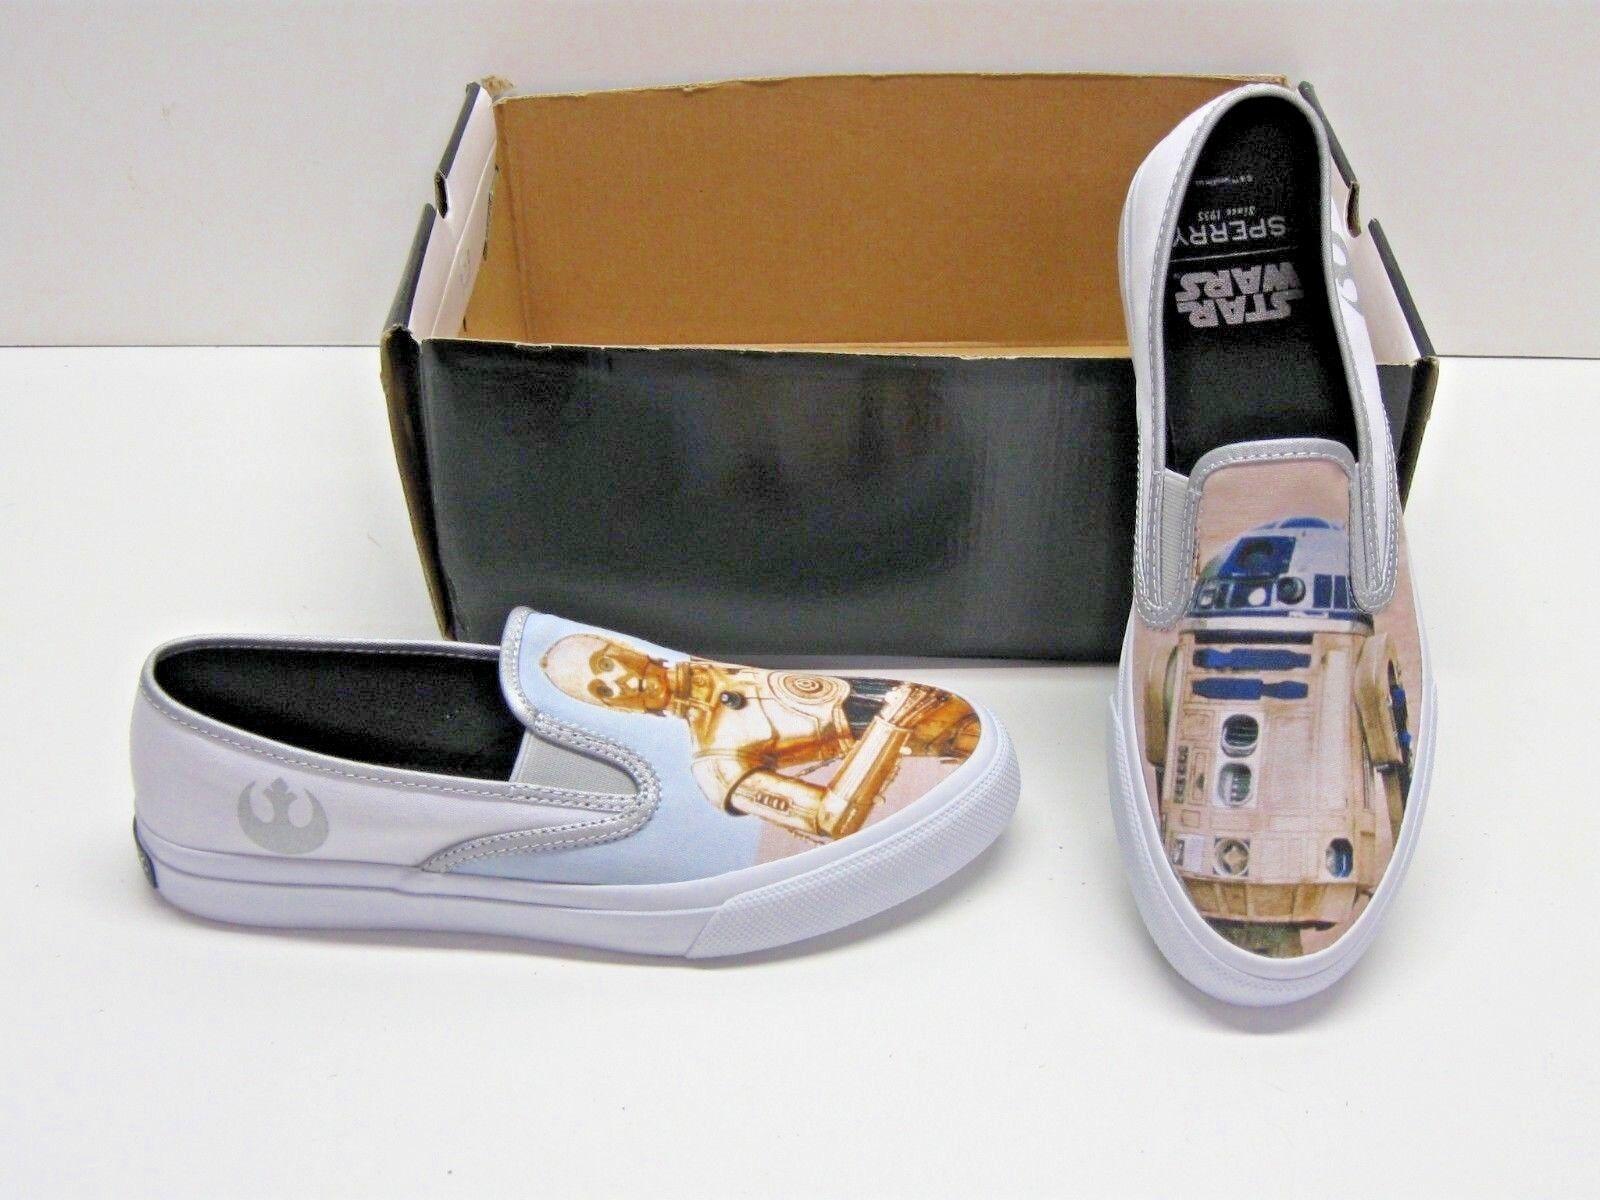 Scarpe casual da uomo Sperry Cloud Star Wars R2-D2 C-3PO White Canvas Slip On Sneakers Shoes uomos 10.5